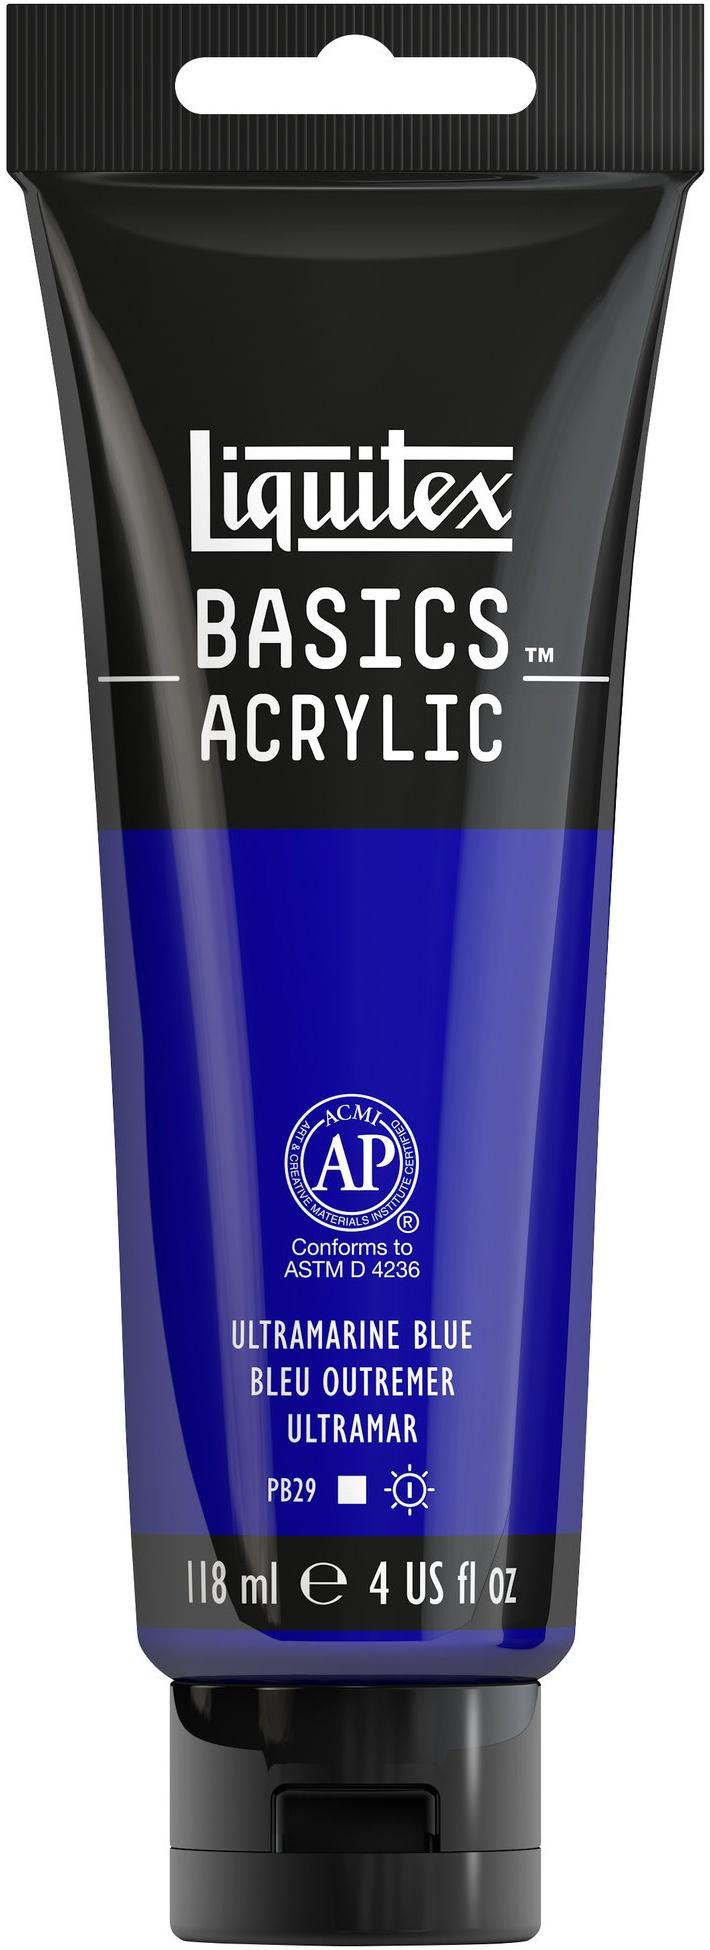 Liquitex BASICS Acrylic Paint 4oz-Ultramarine Blue